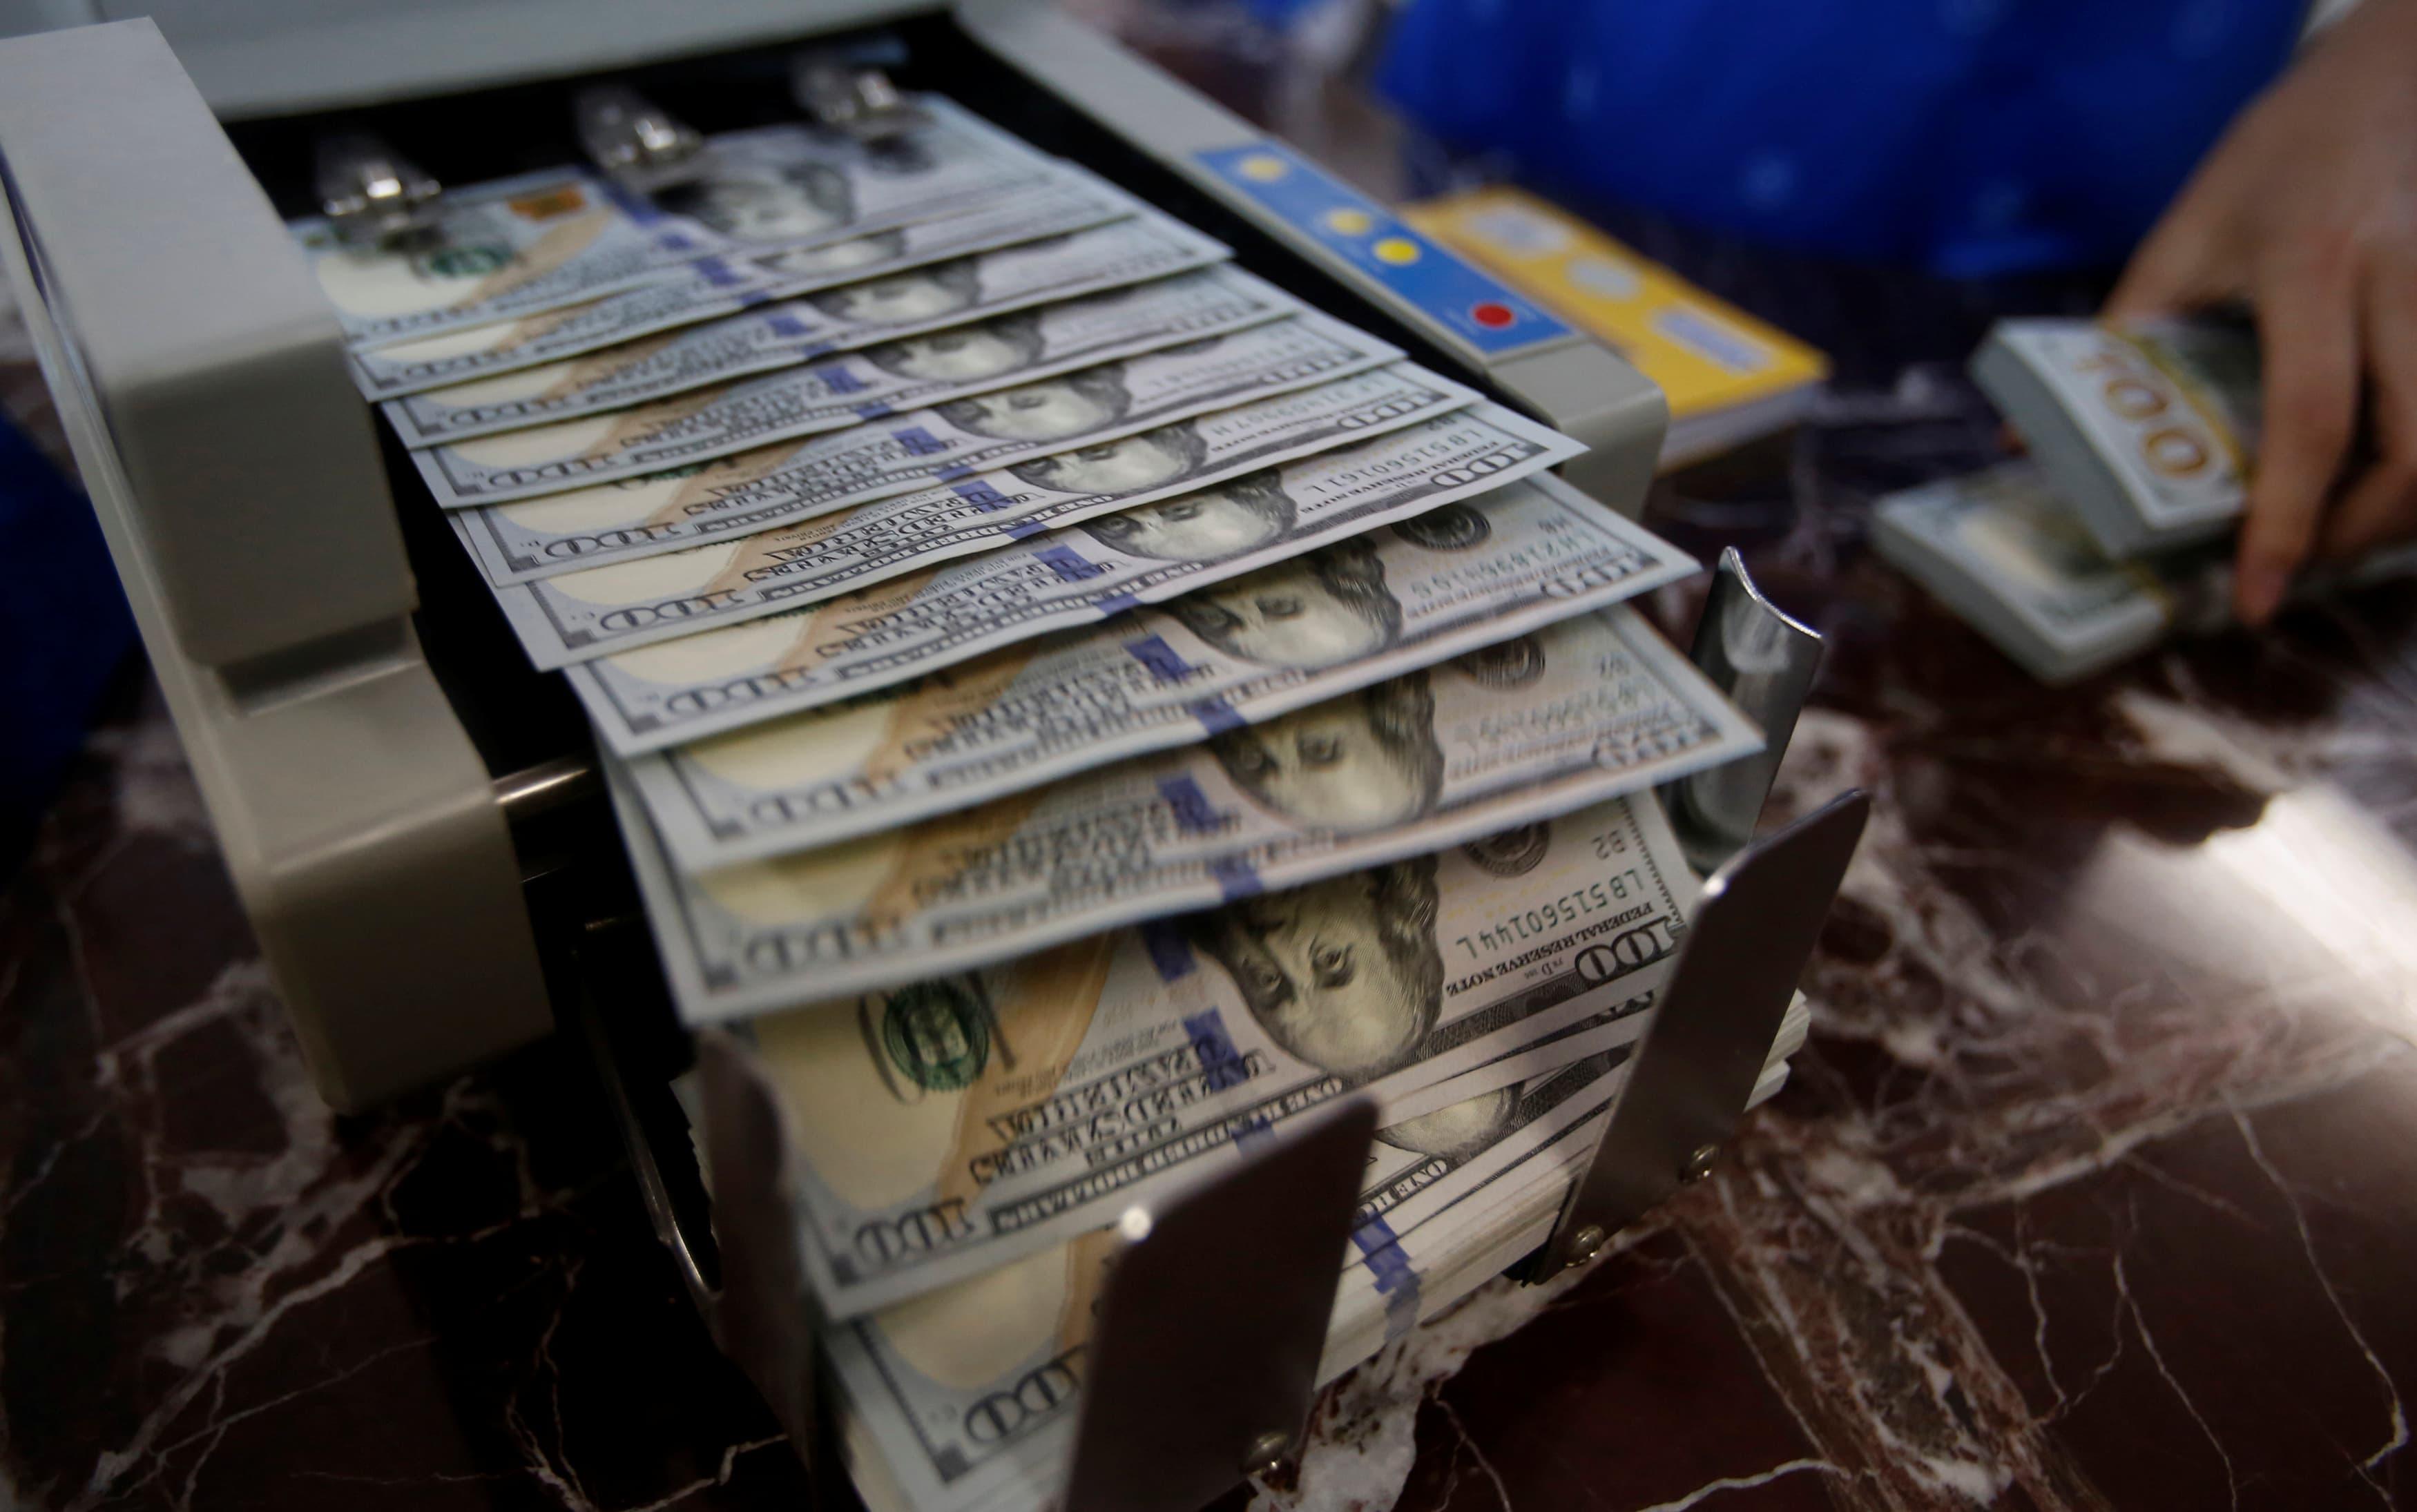 Perevesti dollar v euro форум по теме форекс советник ilan_turbo_beta_v.4.5.1_plus